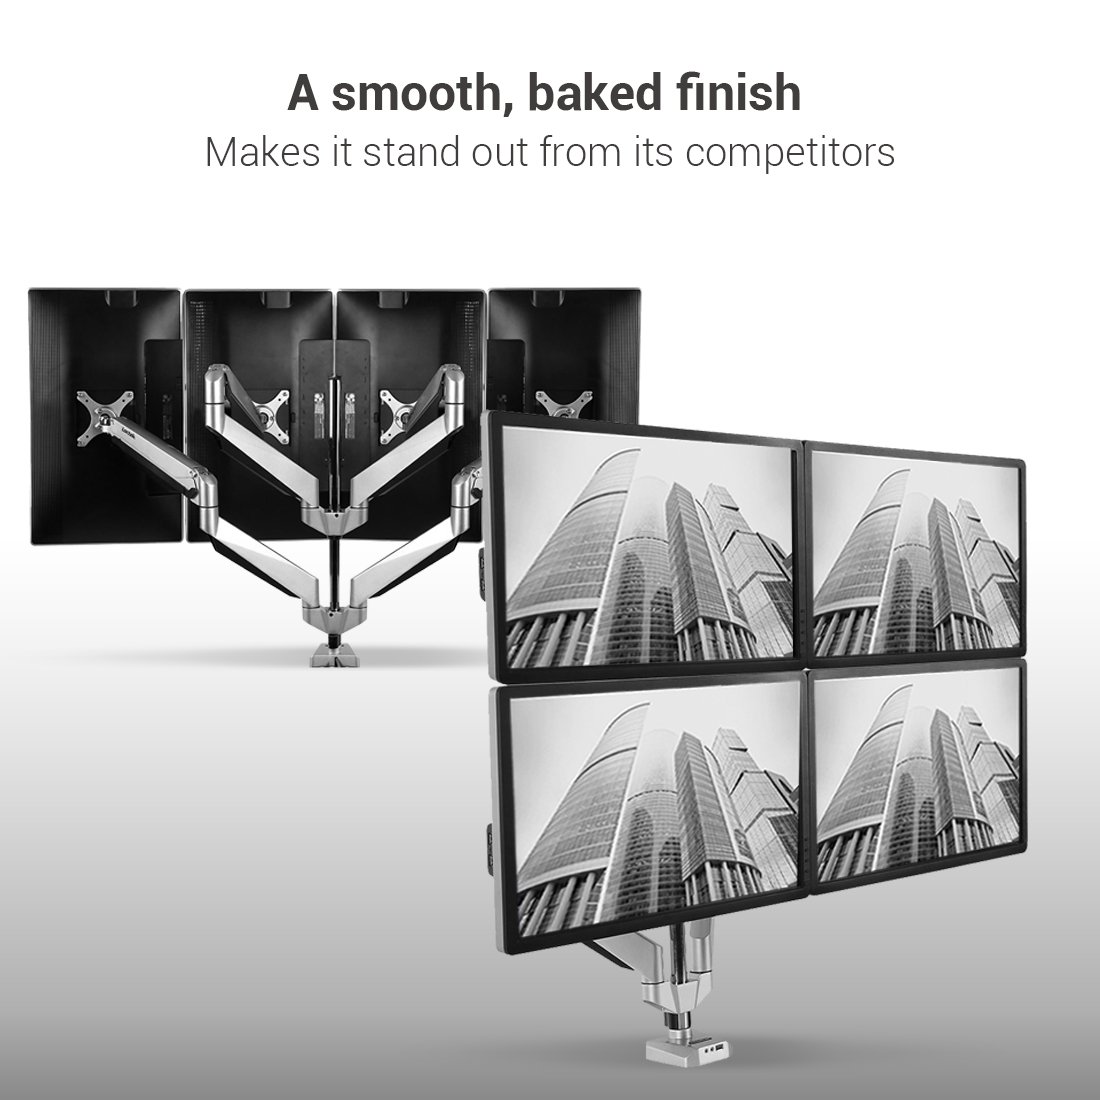 Loctek D7Q Swivel Quad Arm Monitor Mounts Stand for 10''-27'' Computer Screen, Ergonomic Heavy Duty Height Adjustable Desk Mount by Loctek (Image #4)